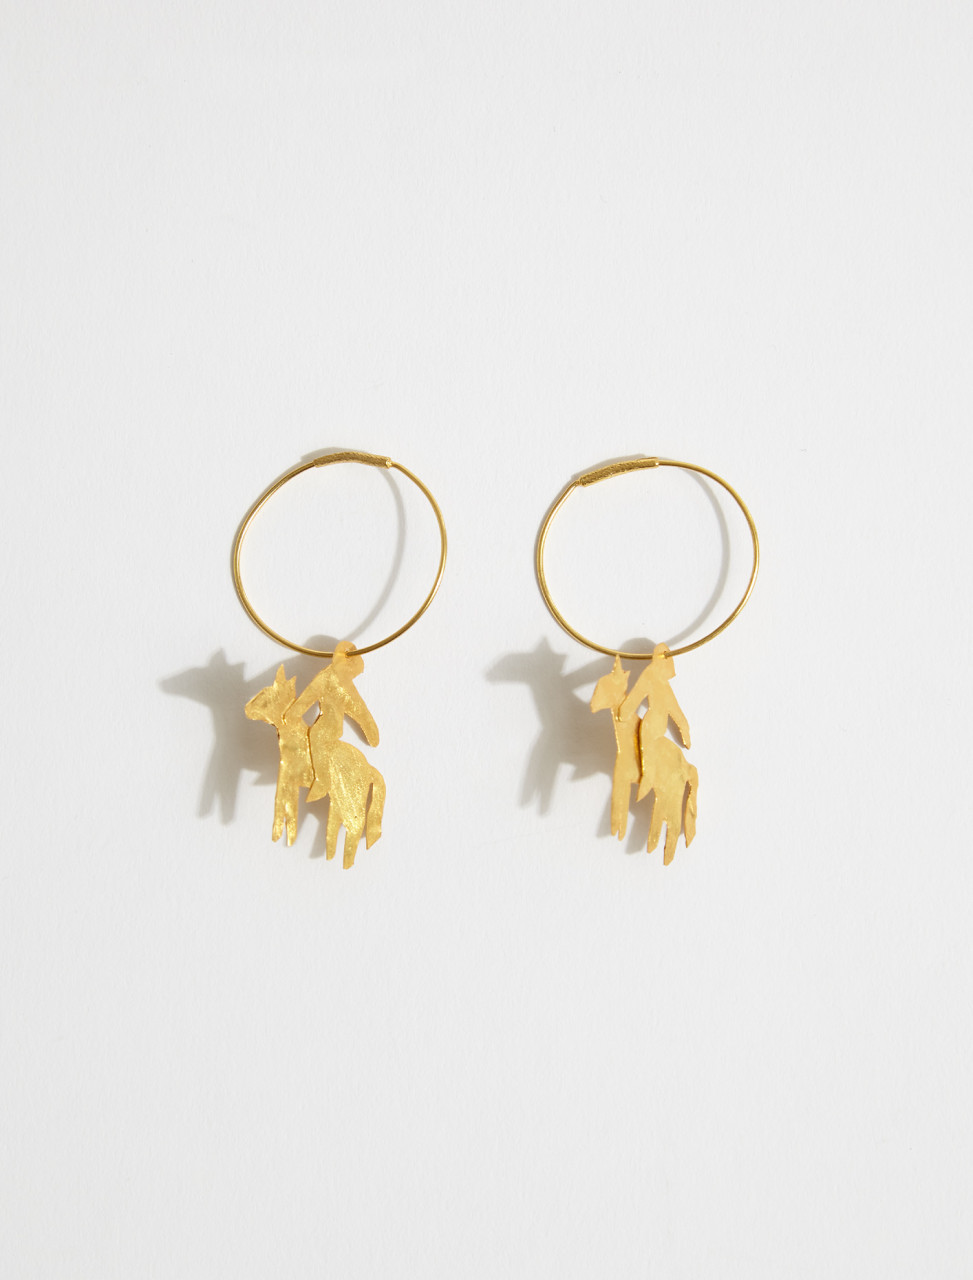 1000735 APRES SKI JINETE B CHEVALIER CHARM EARRINGS IN GOLD